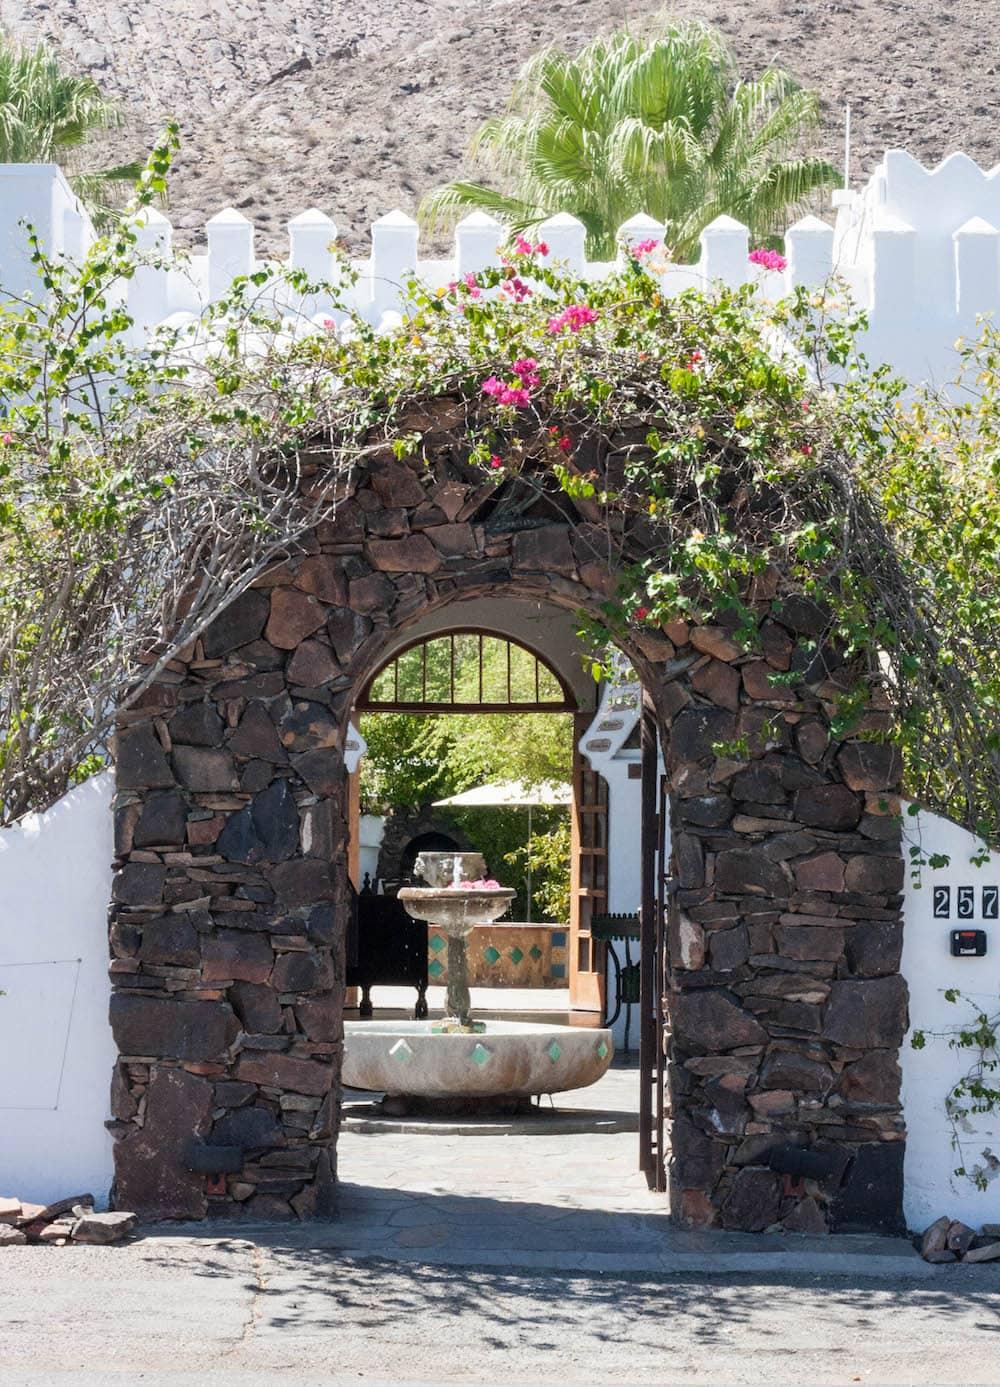 Korakia Pensione, Palm Springs- Should You Stay? (1 of 1)-3